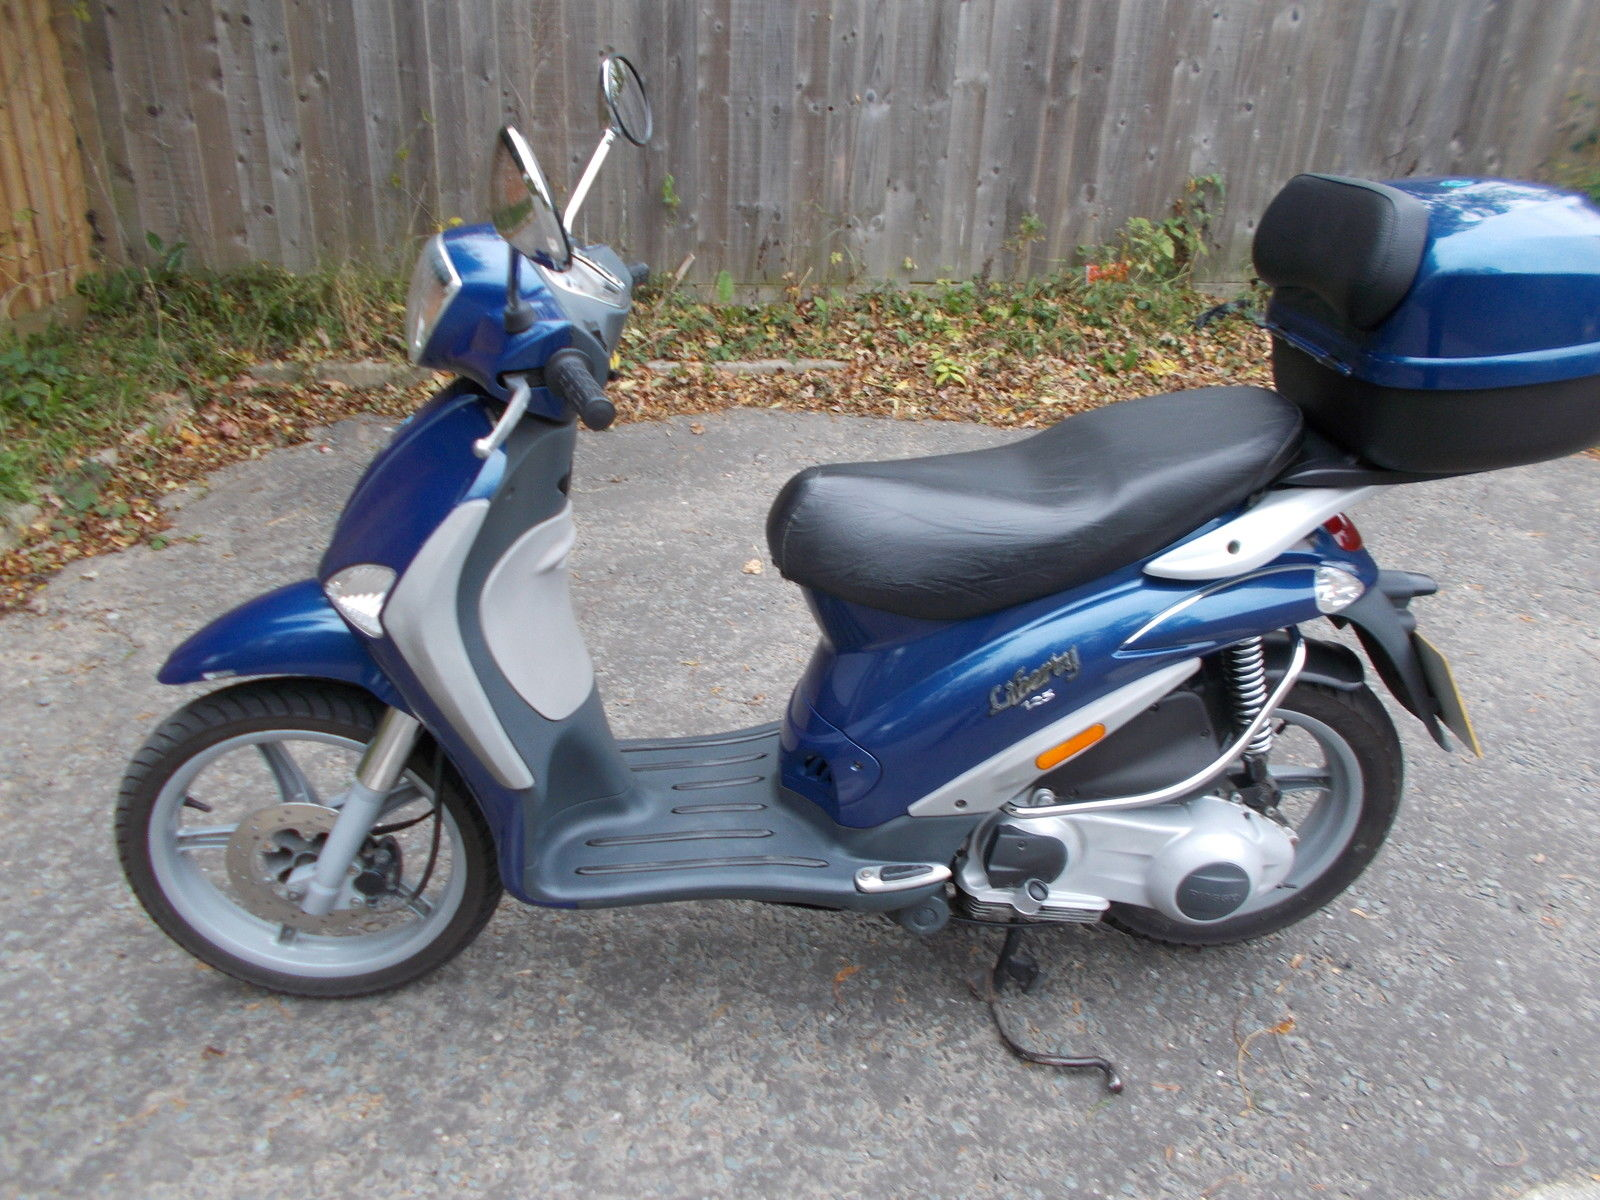 piaggio liberty scooter 125cc colour blue. Black Bedroom Furniture Sets. Home Design Ideas